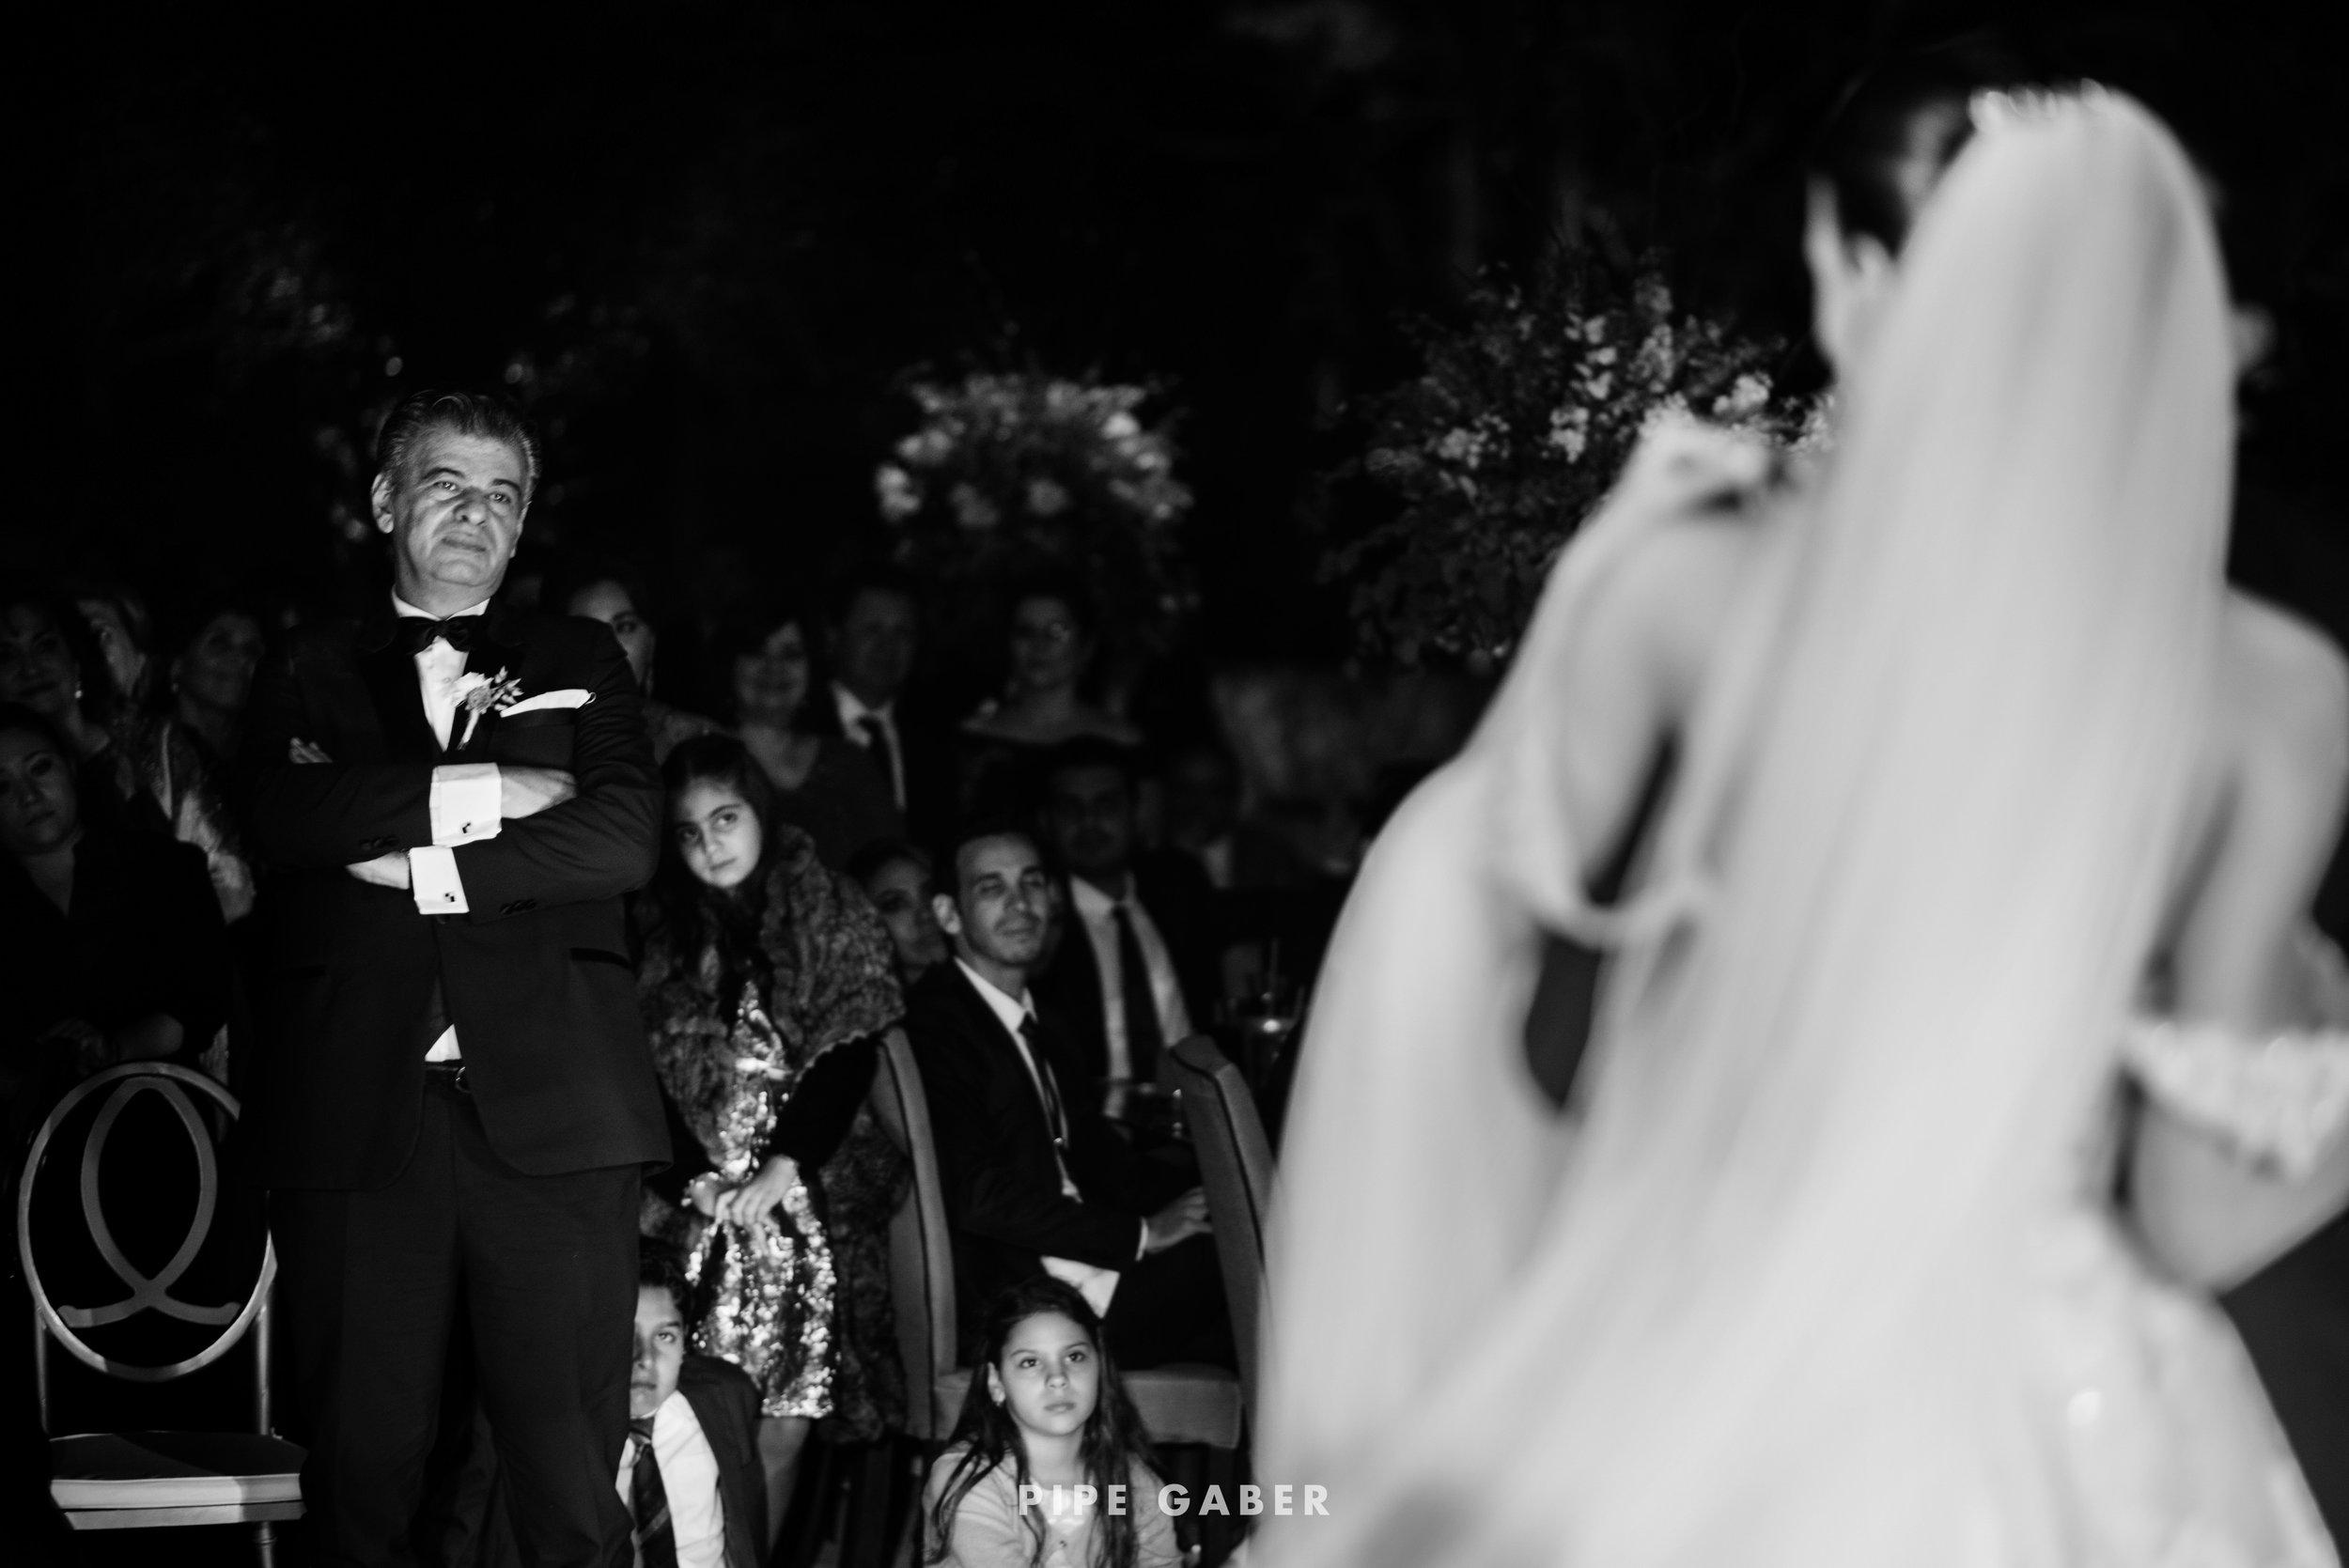 18_02_03_WEDDING_ALEXIS_ABIMERHI_ERICK_APT_2556.jpg